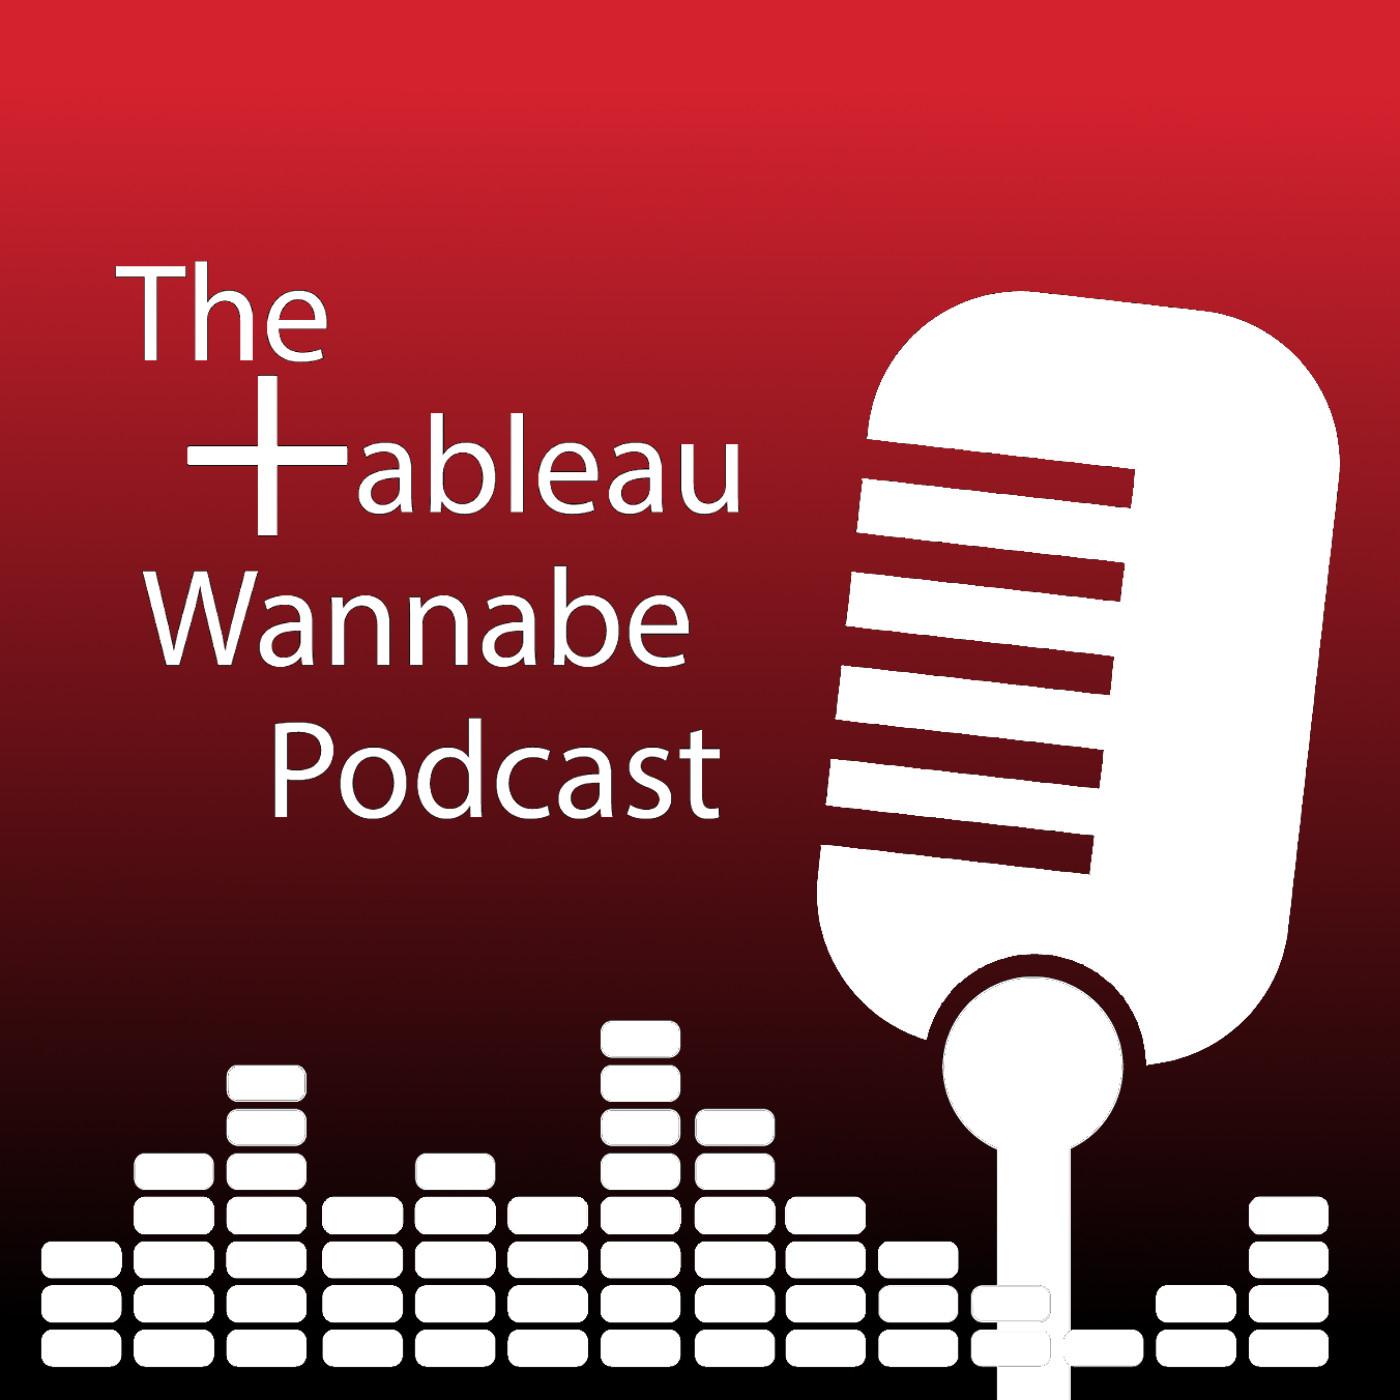 The Tableau Wannabe Podcast show art